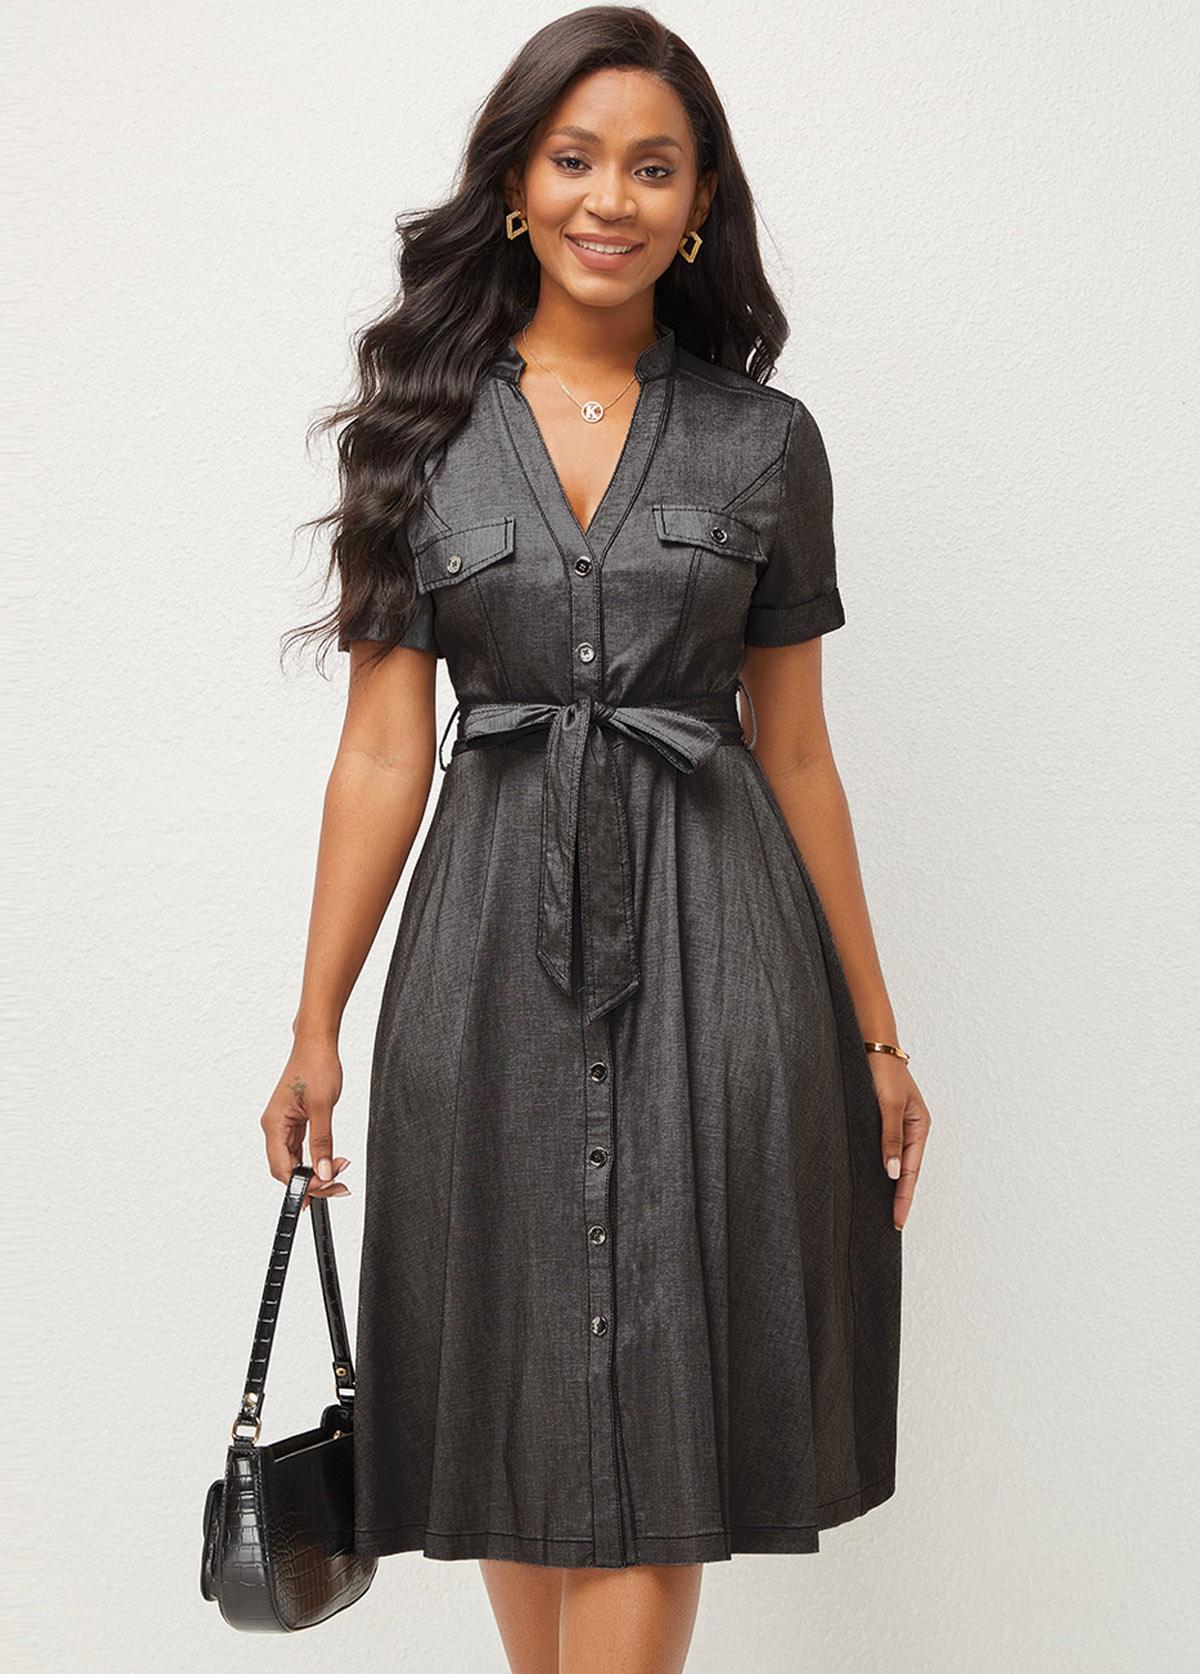 V Neck Button Up Short Sleeve Dress